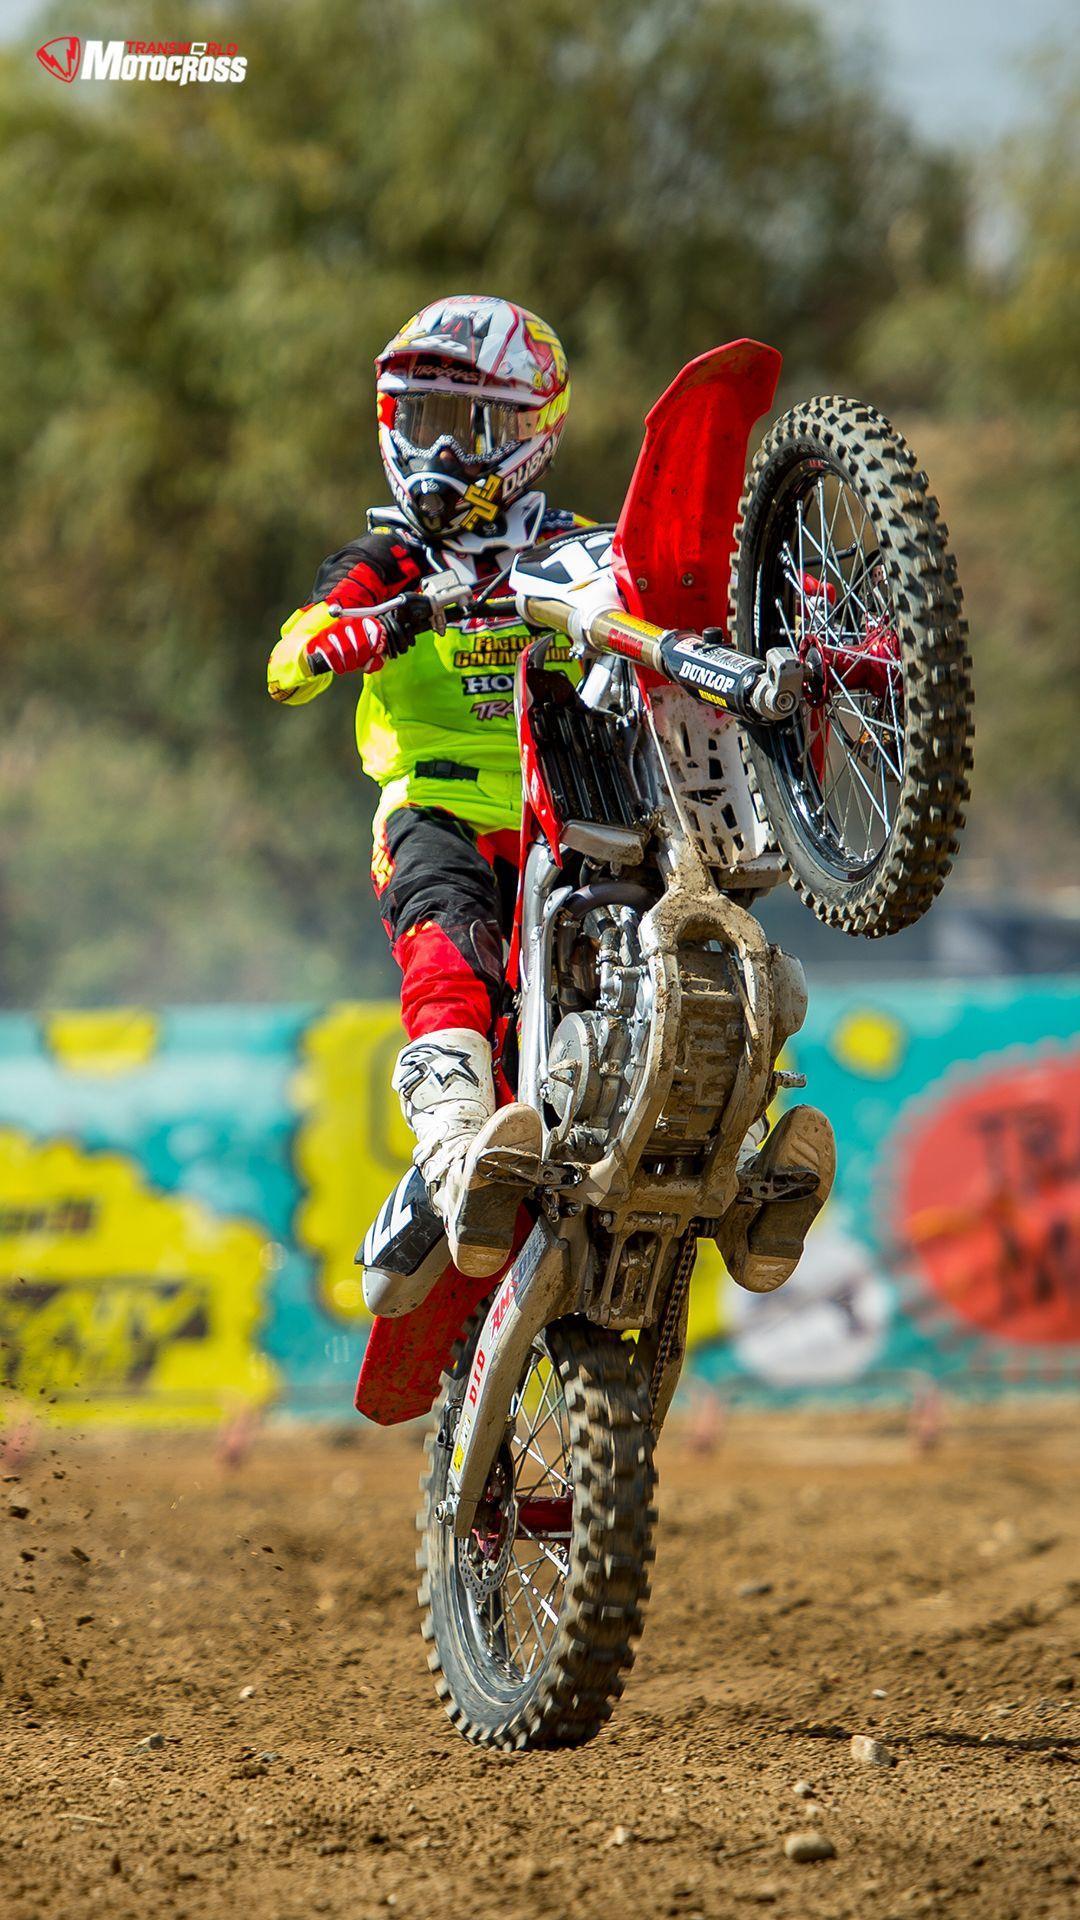 Sfondi motocross 4k